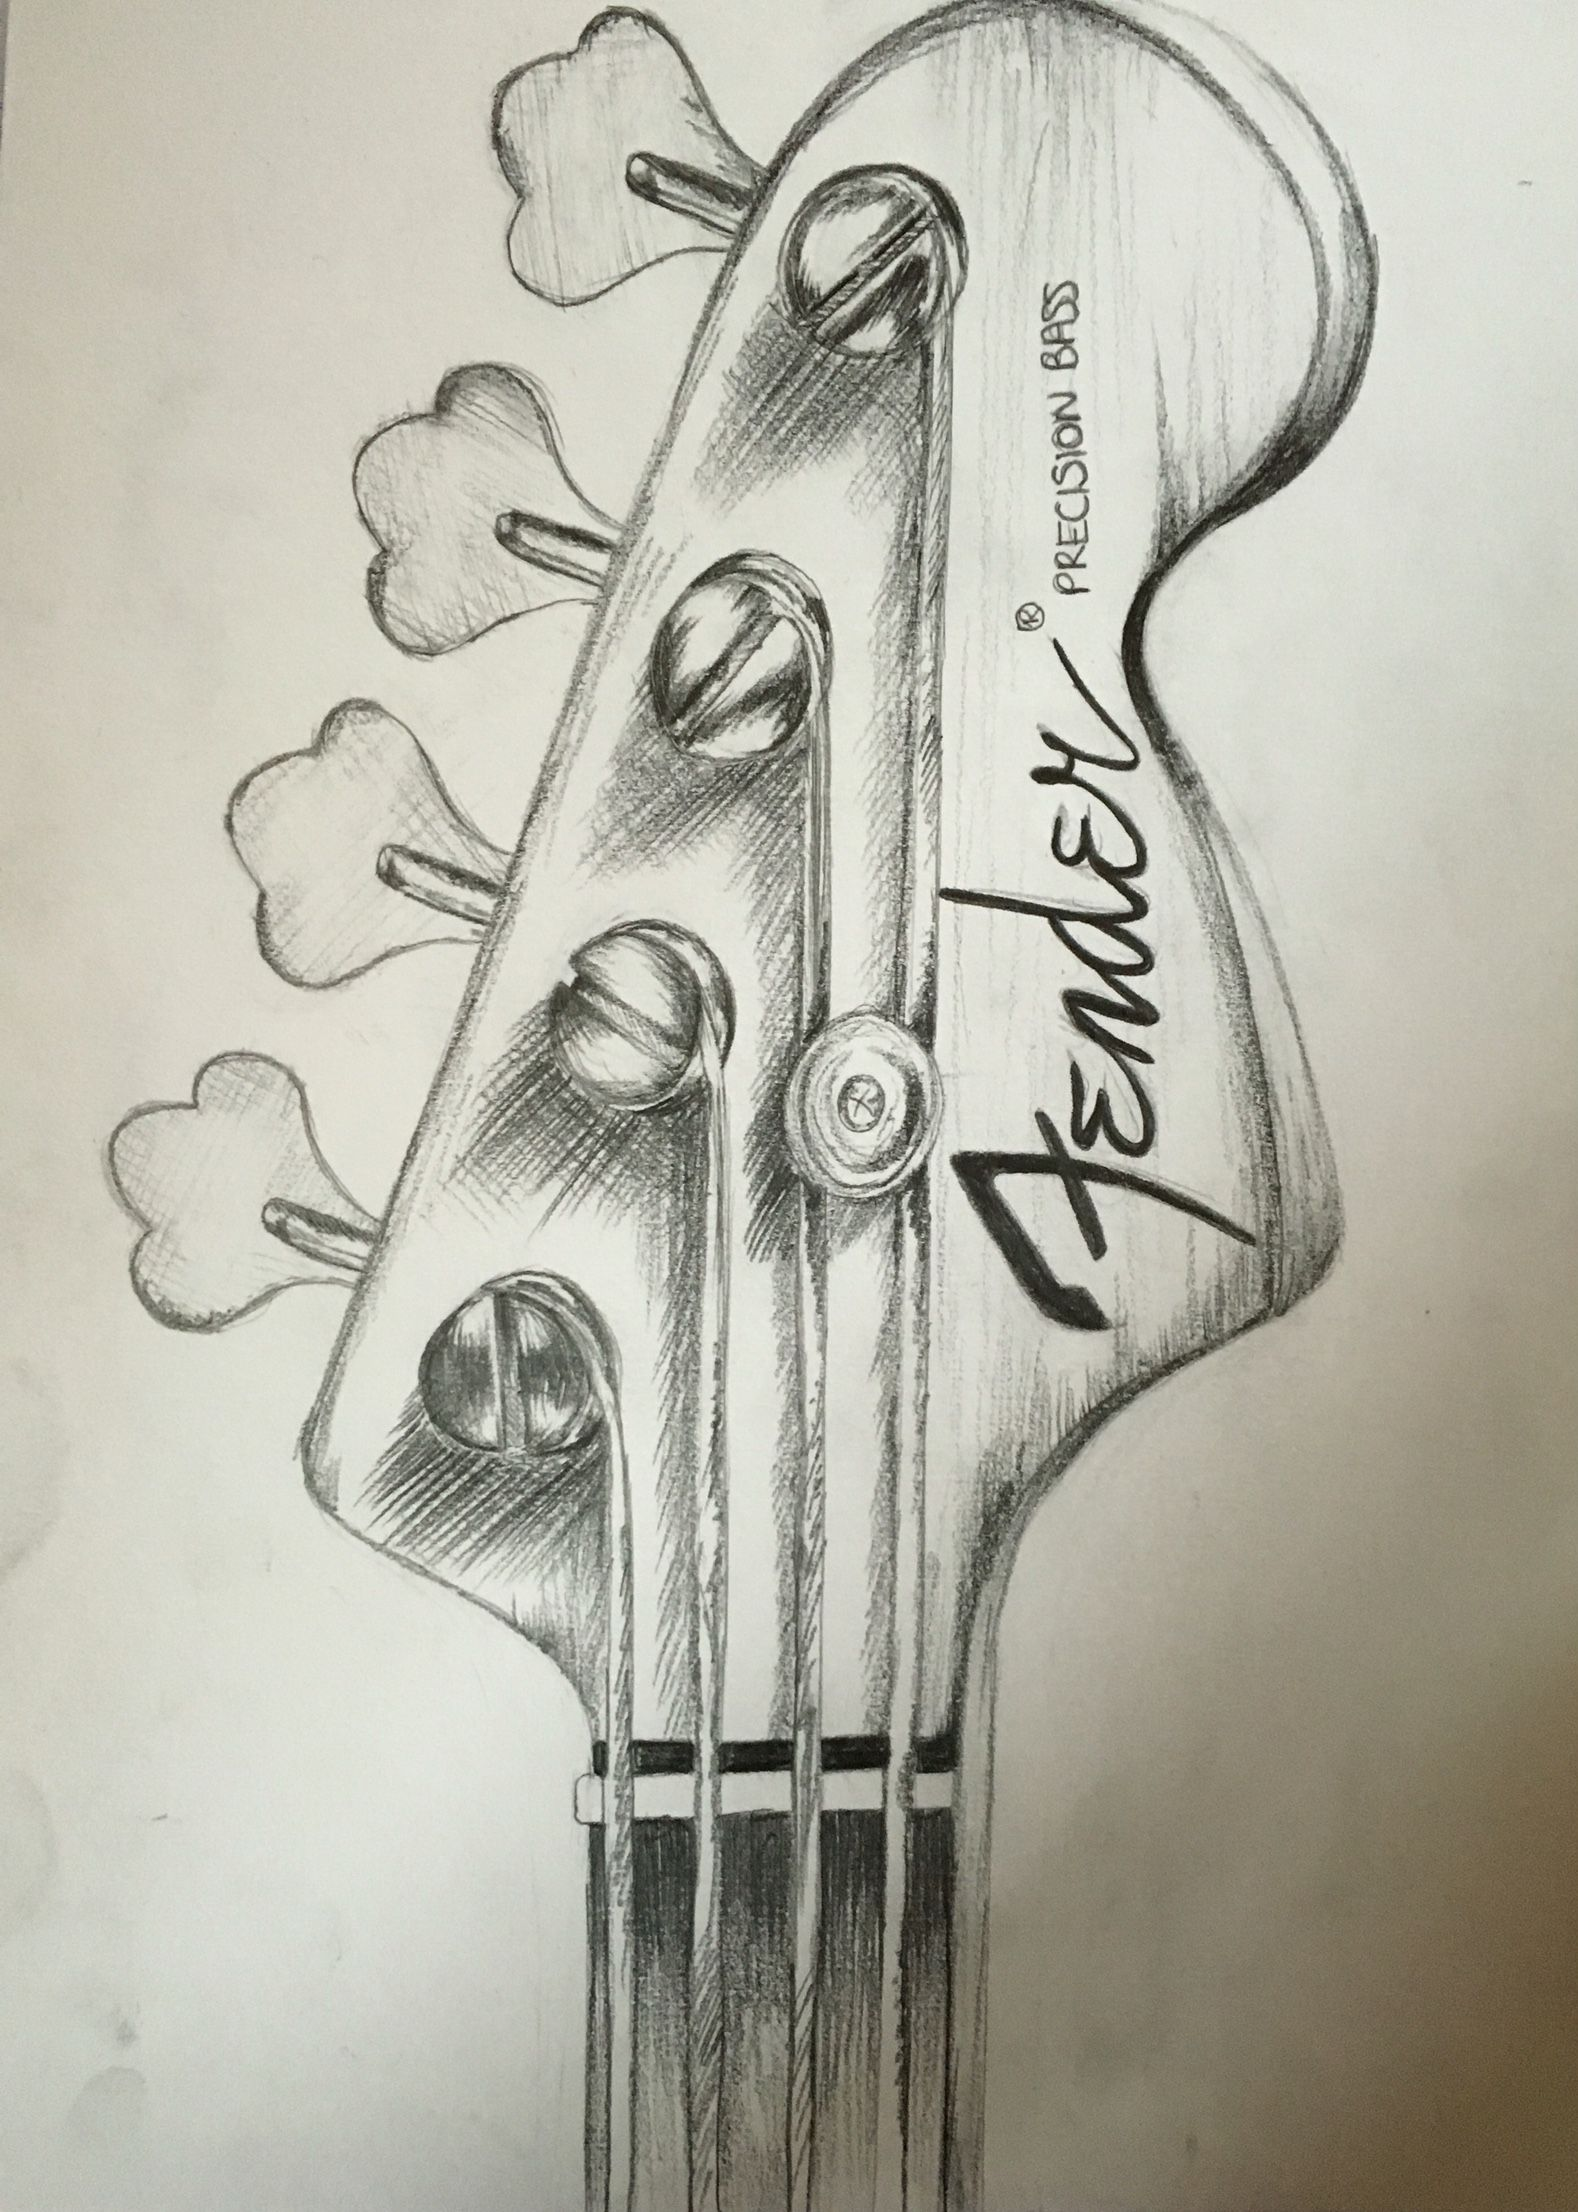 Fender Guitar Pencil Drawing By Me Guitar Drawing Pencil